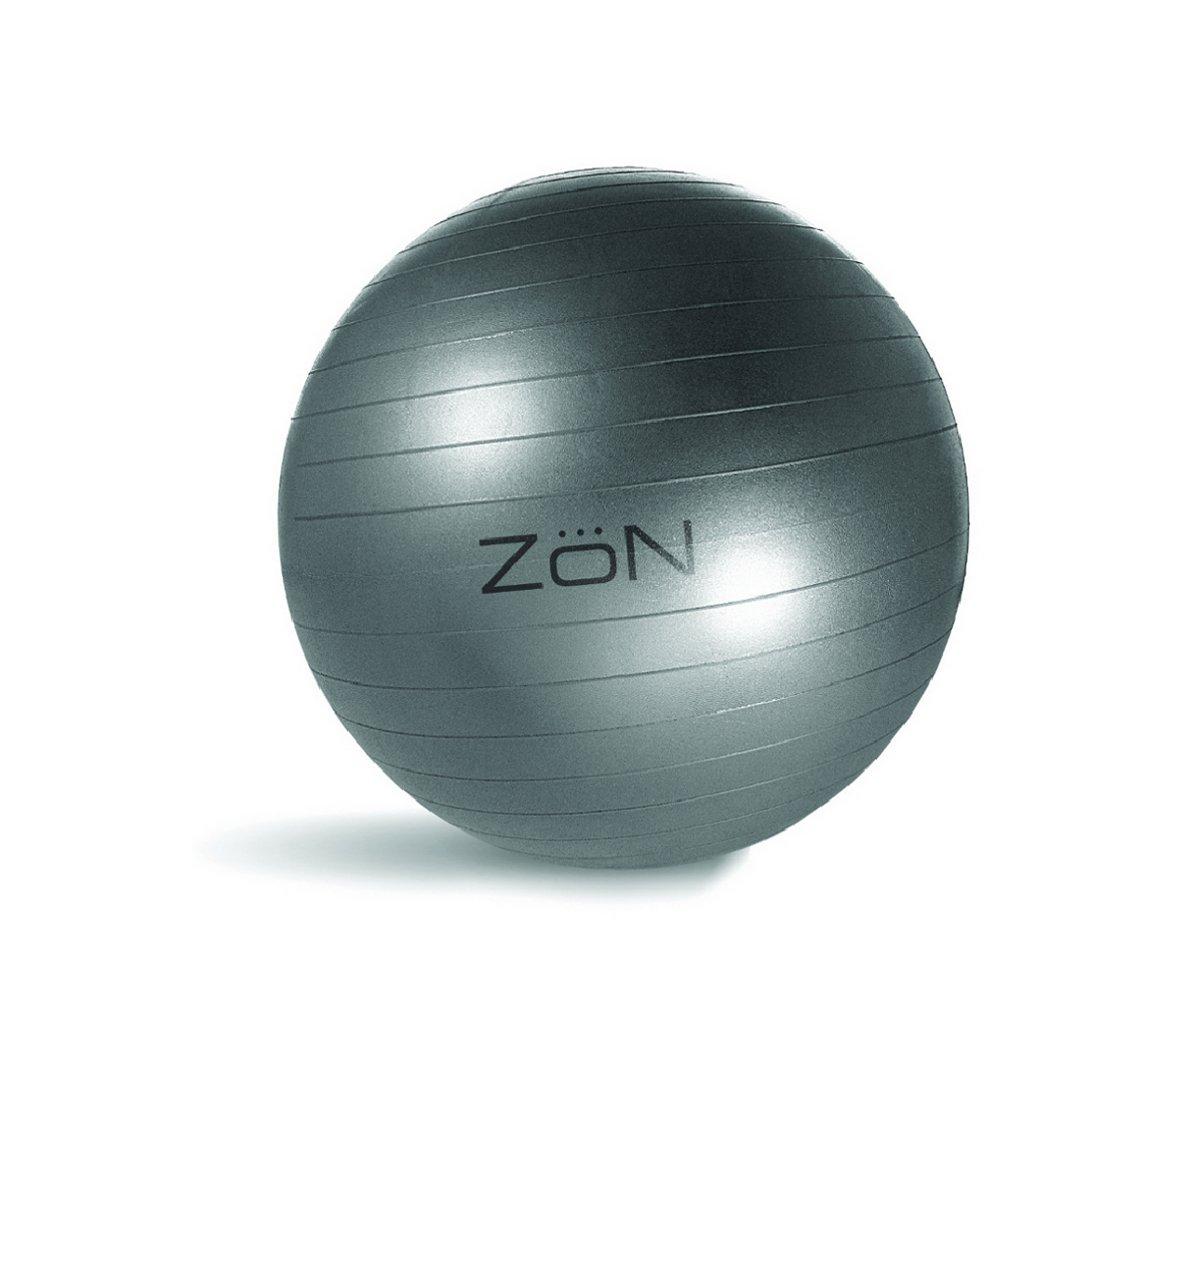 Zon Anti Burst Balance Ball (Silber / Schwarz)